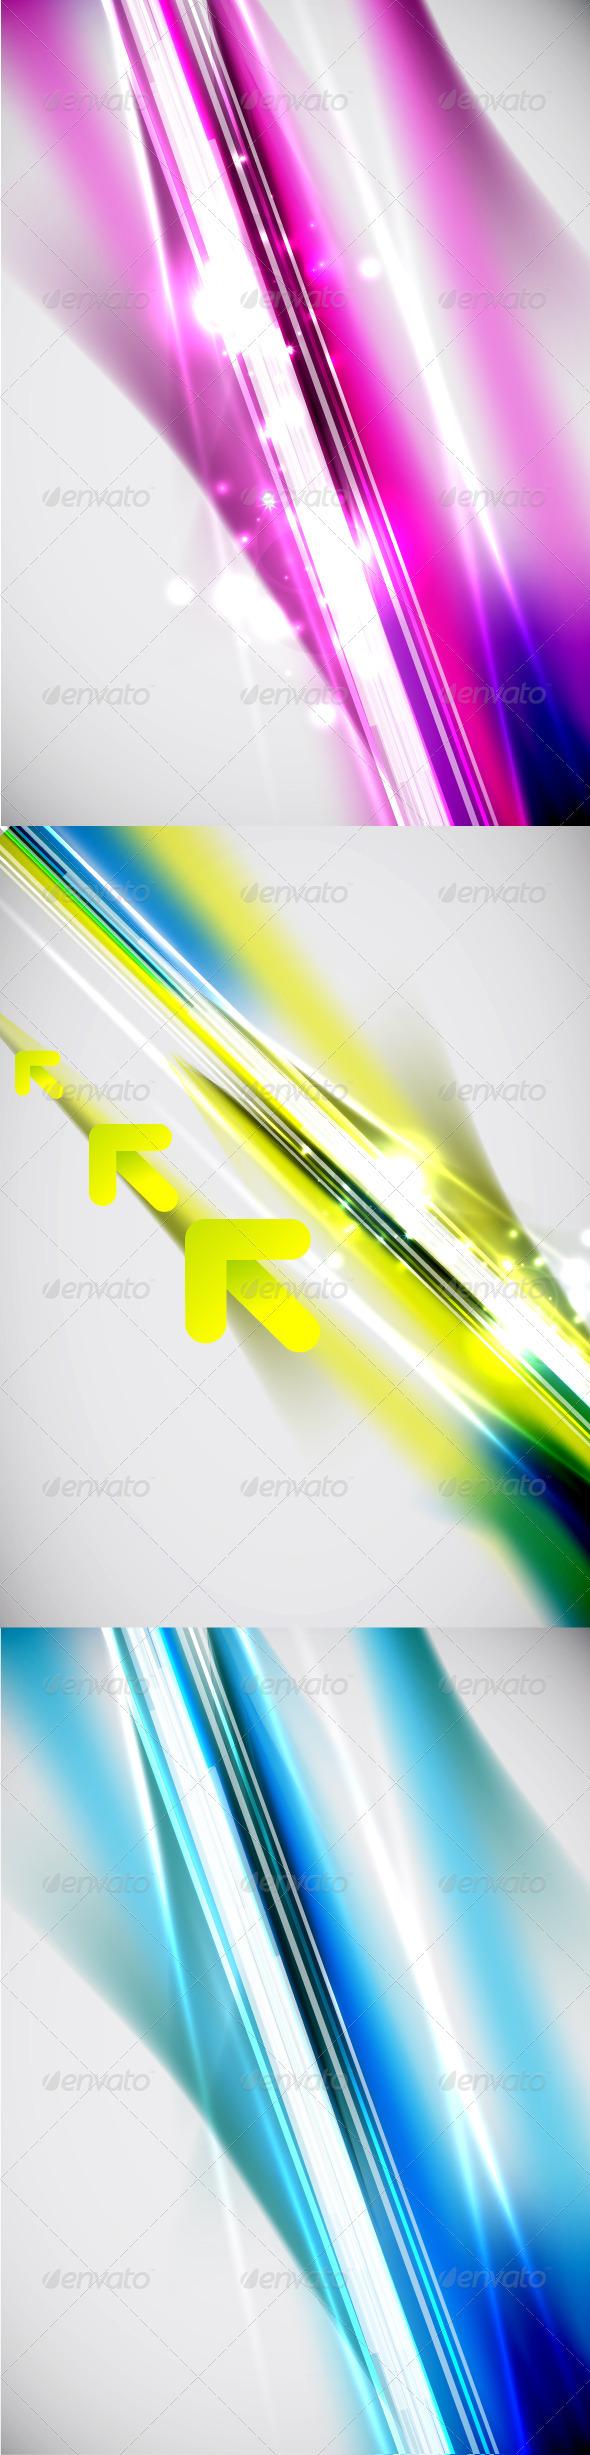 Shiny Motion Backgrounds - Backgrounds Decorative